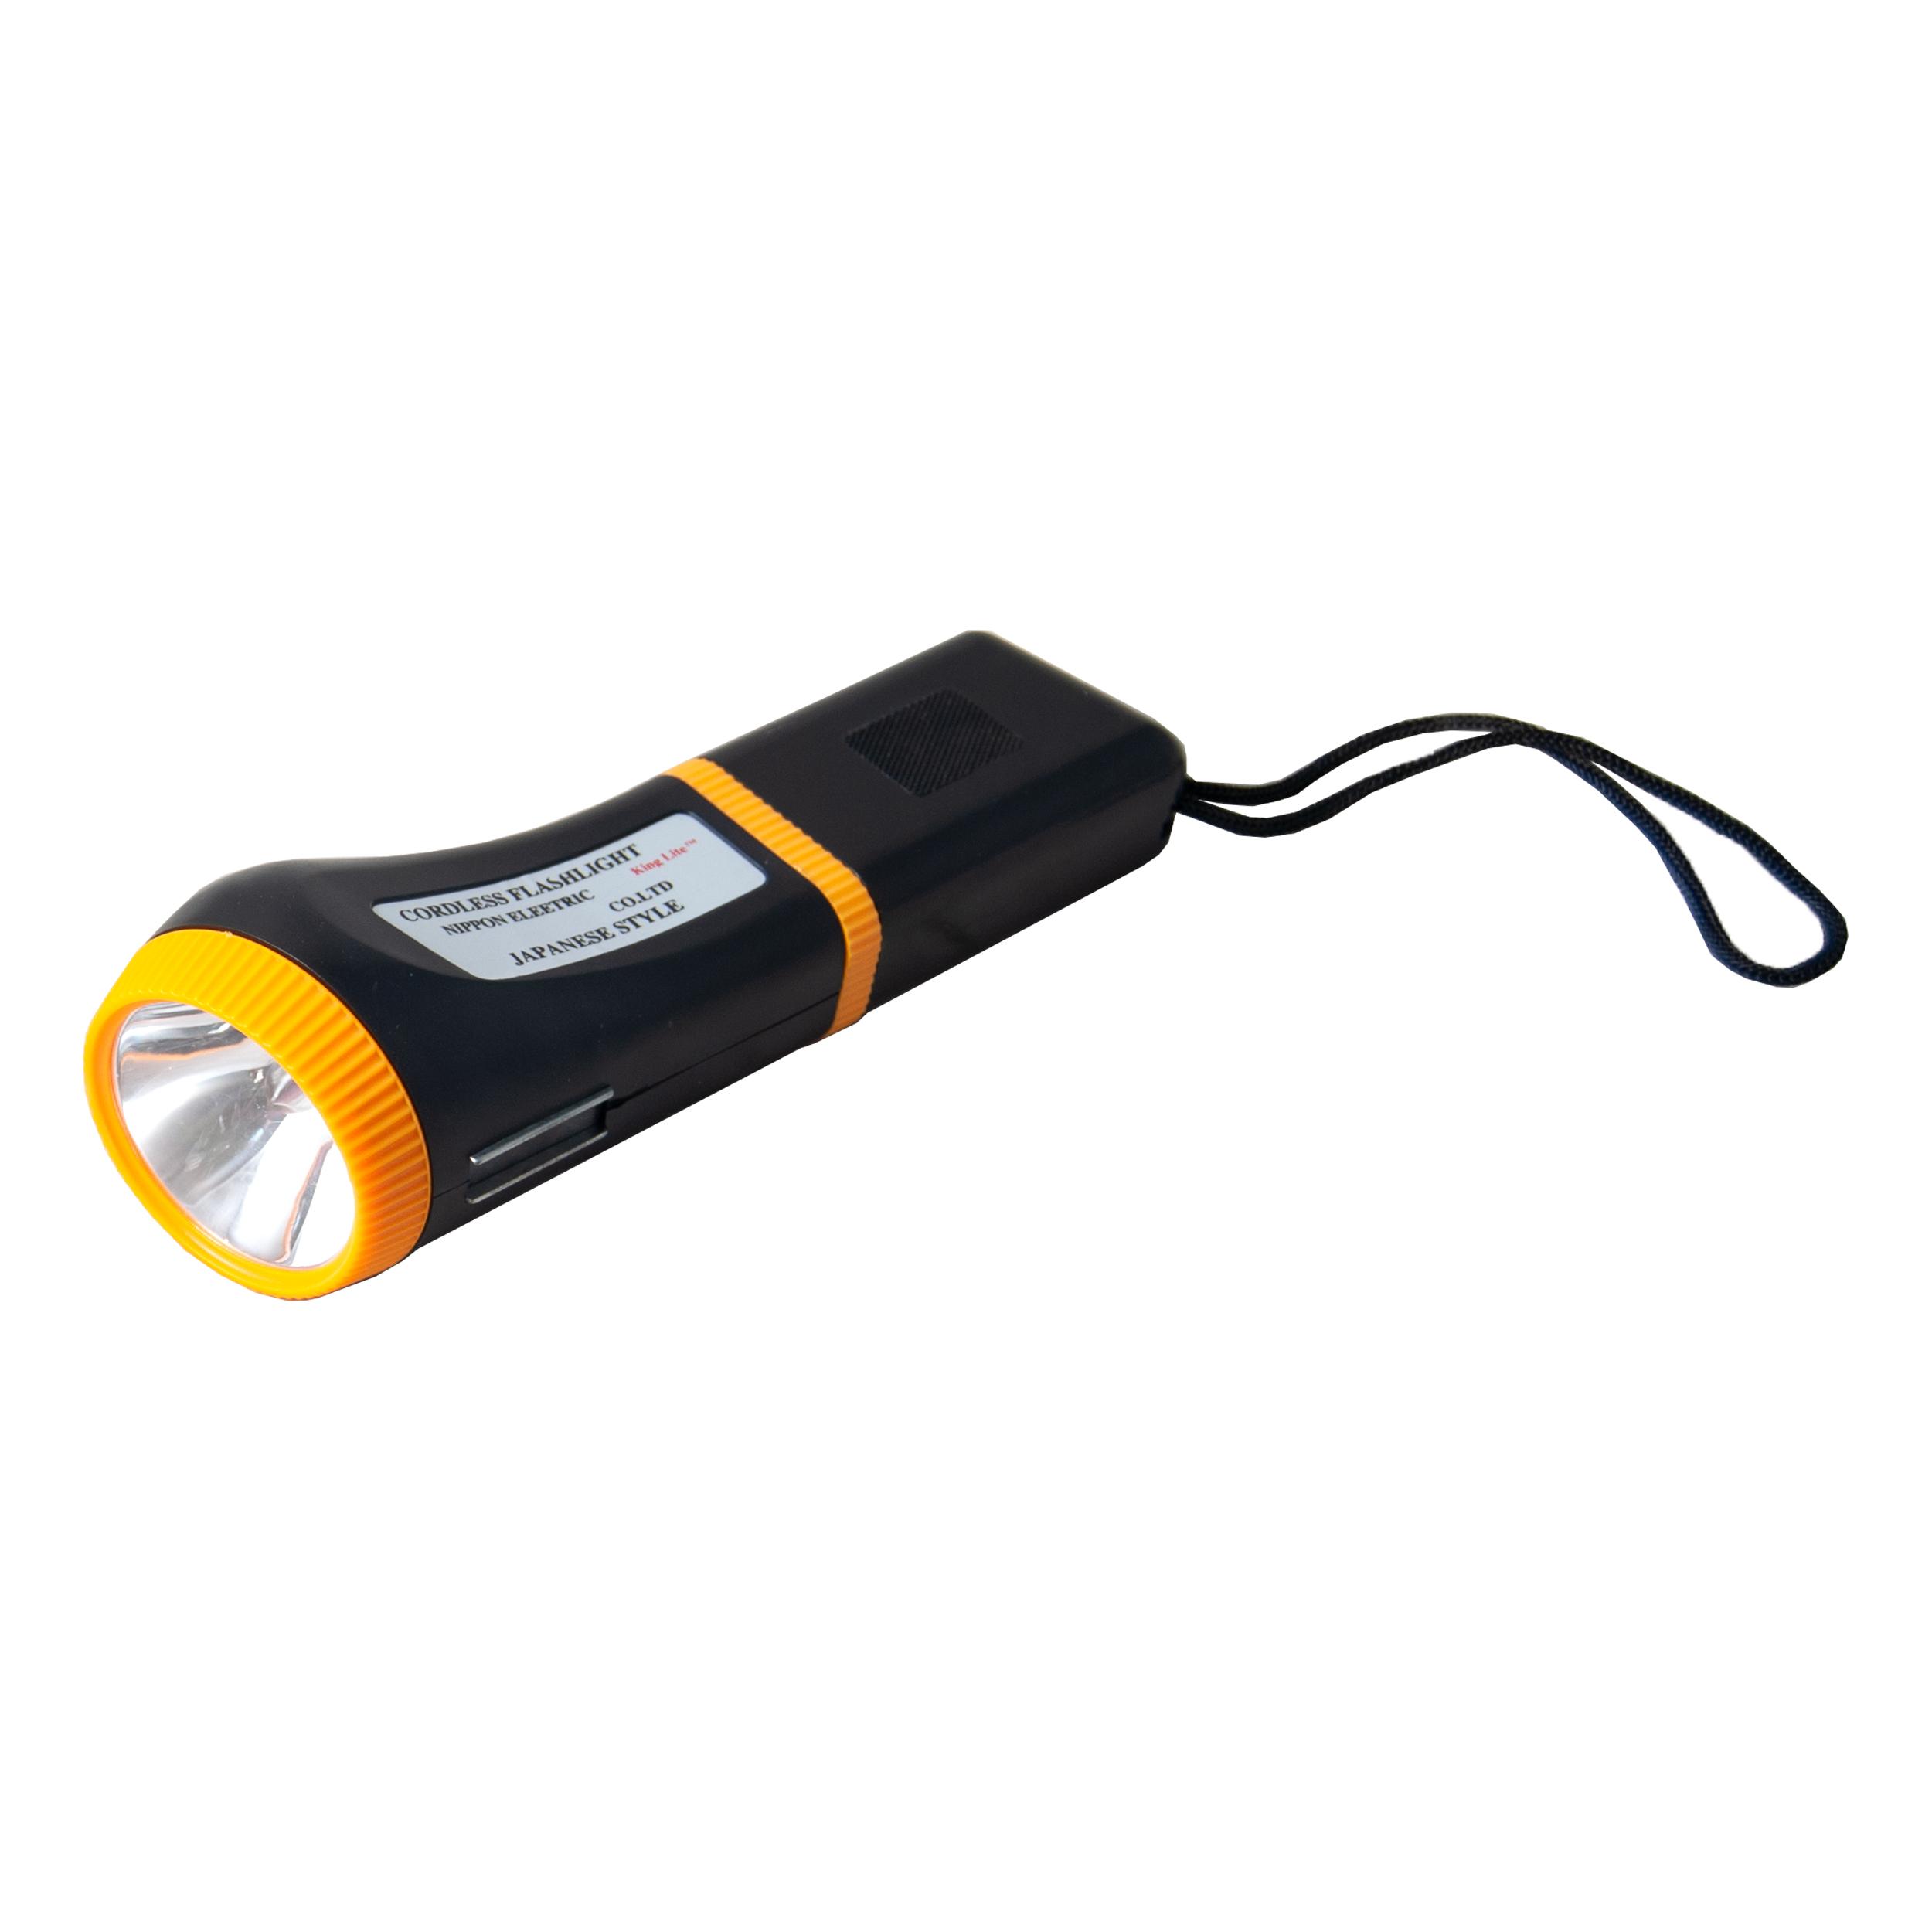 خرید                                      چراغ قوه سانی مدل NL-1000N